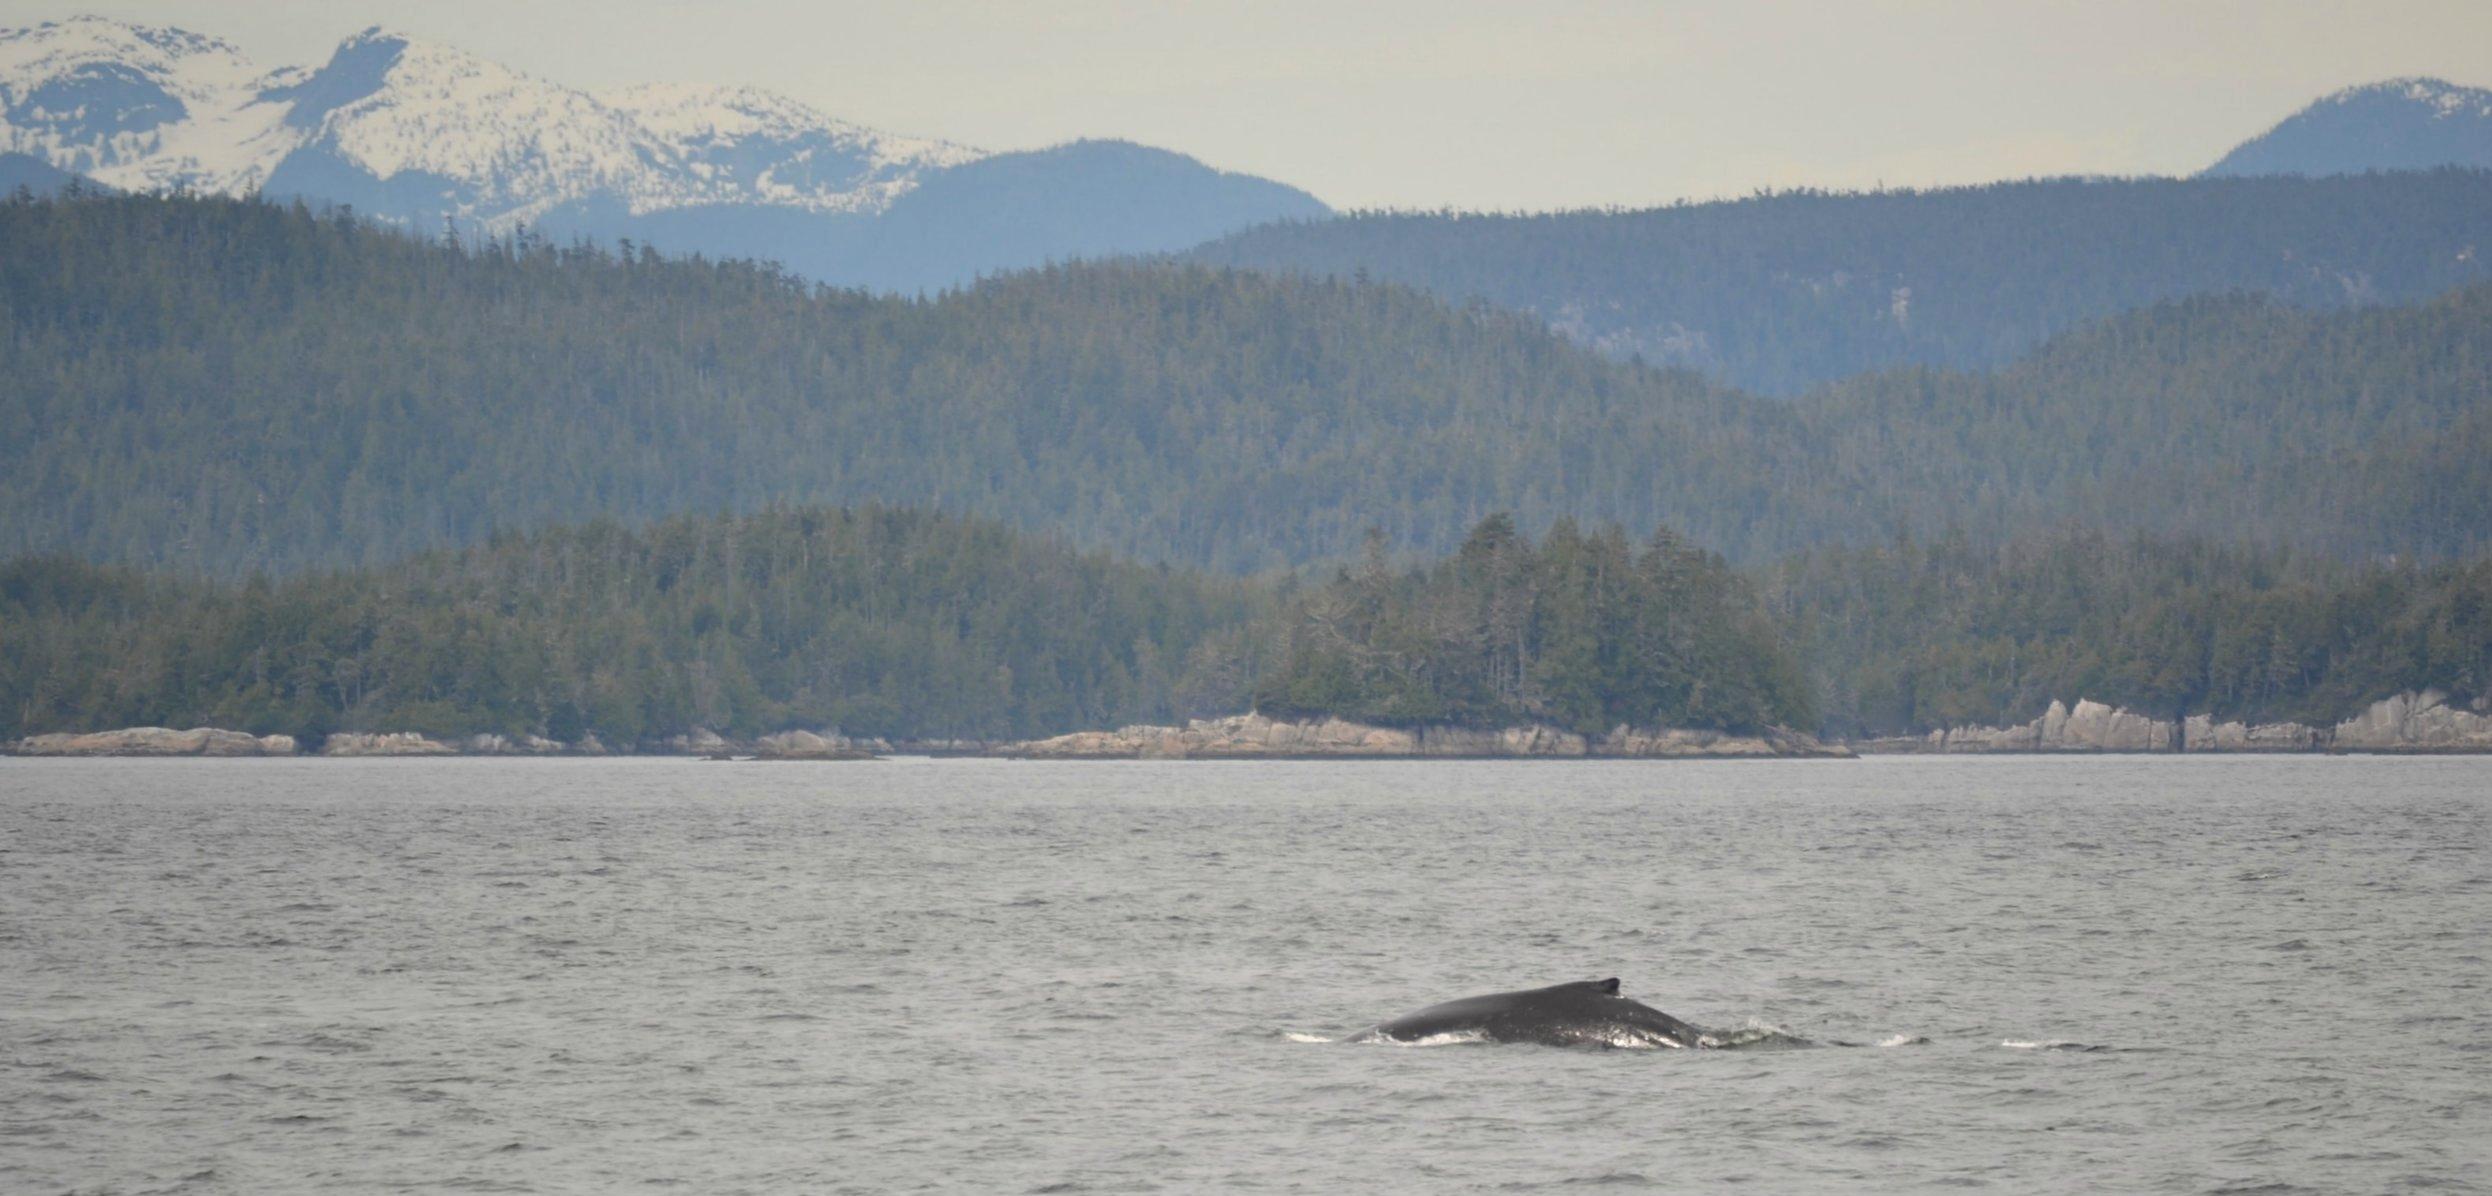 stubbs-whale-watching-orca.jpg